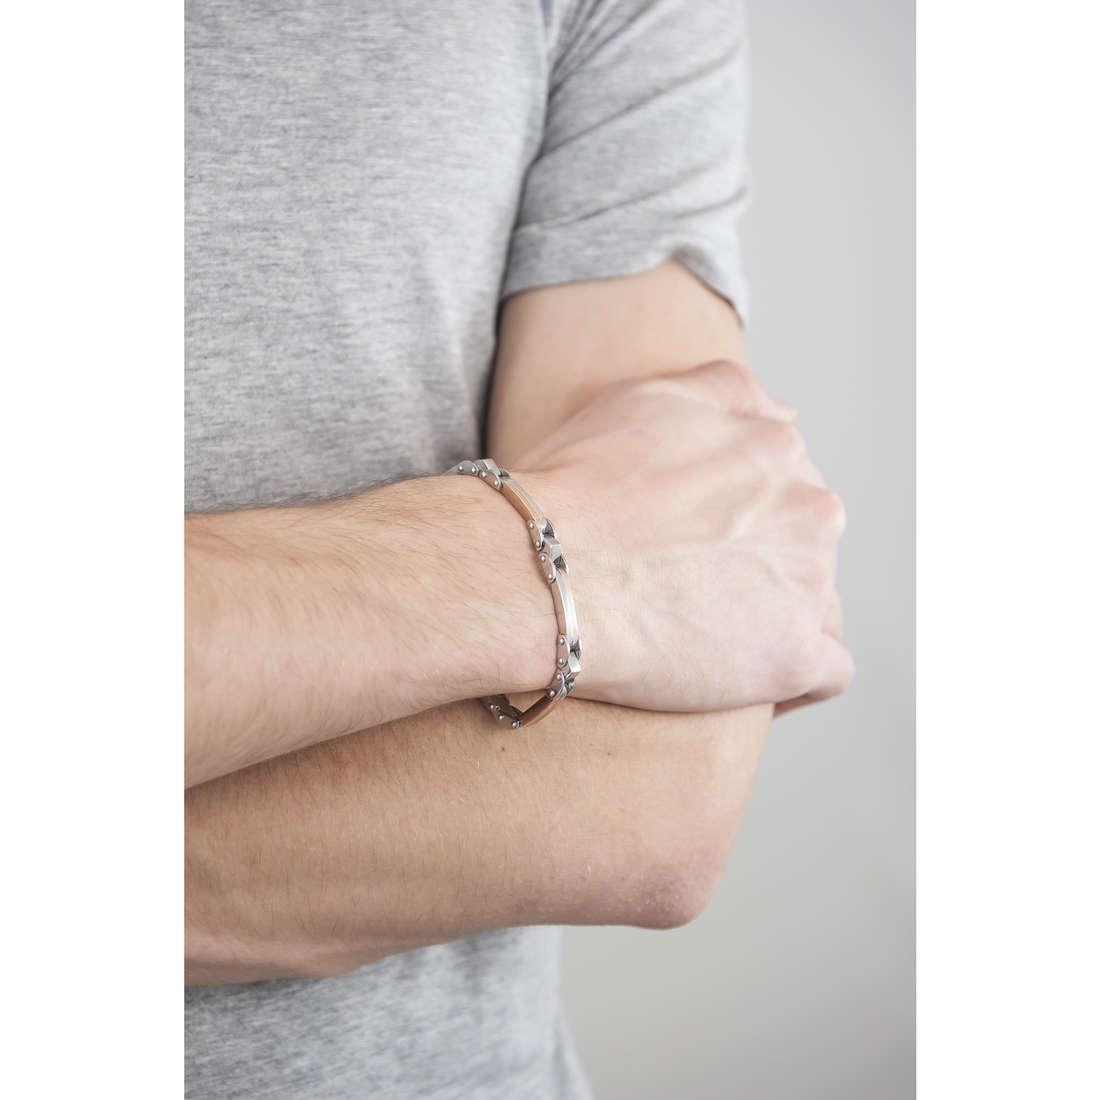 Morellato bracciali Urban uomo SABH09 indosso